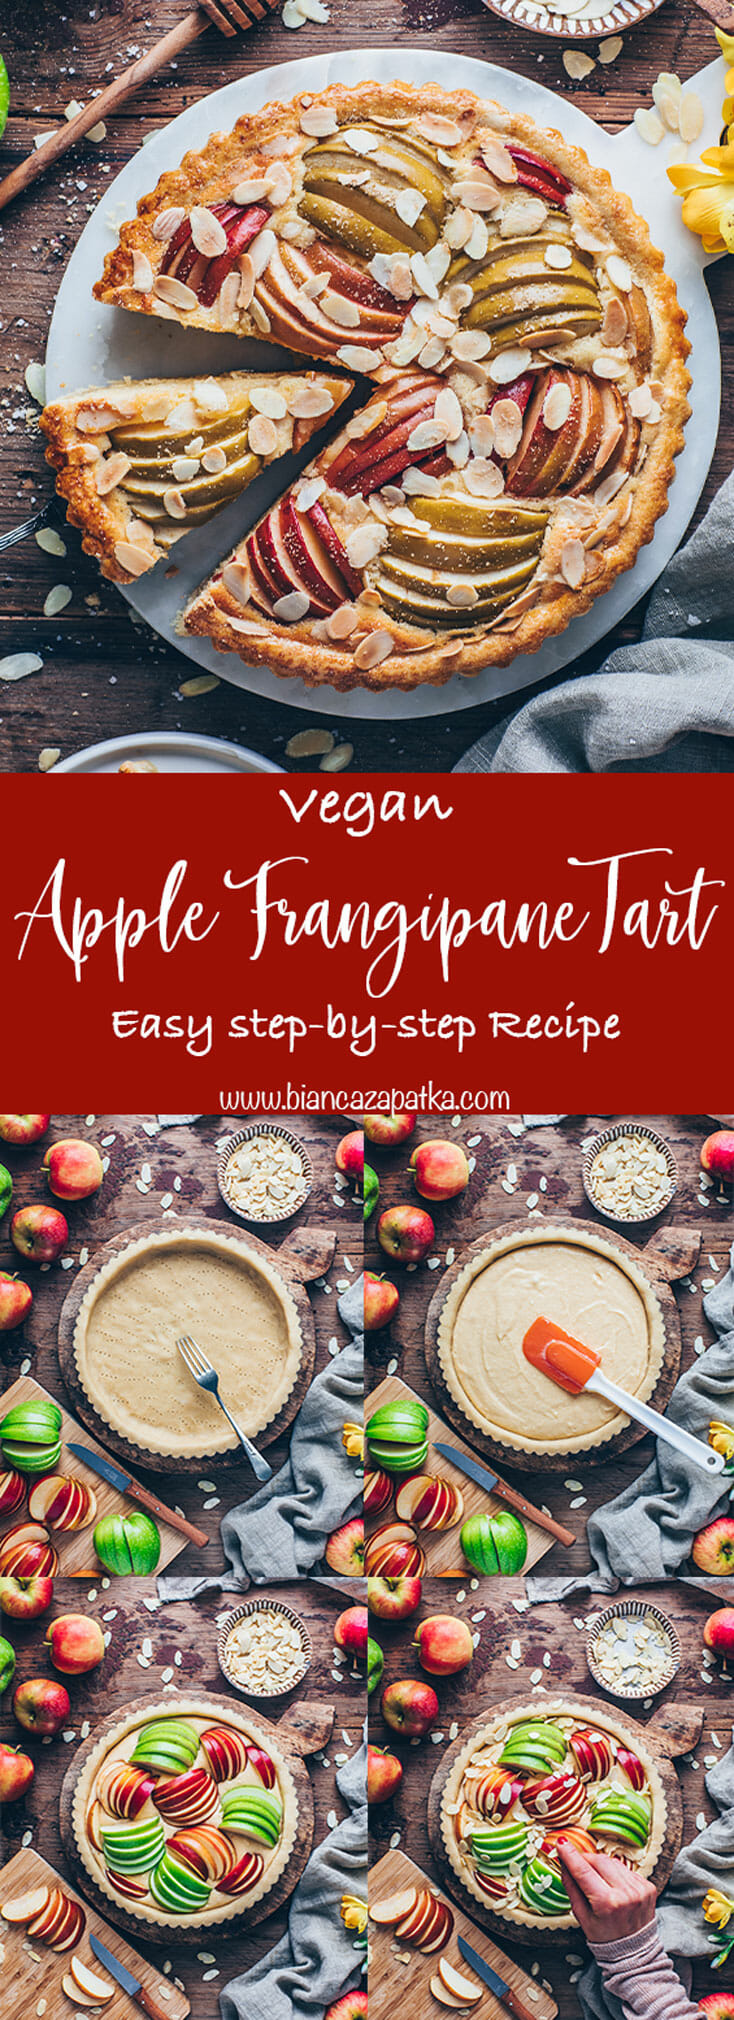 French Apple Frangipane Tart with Almonds Recipe